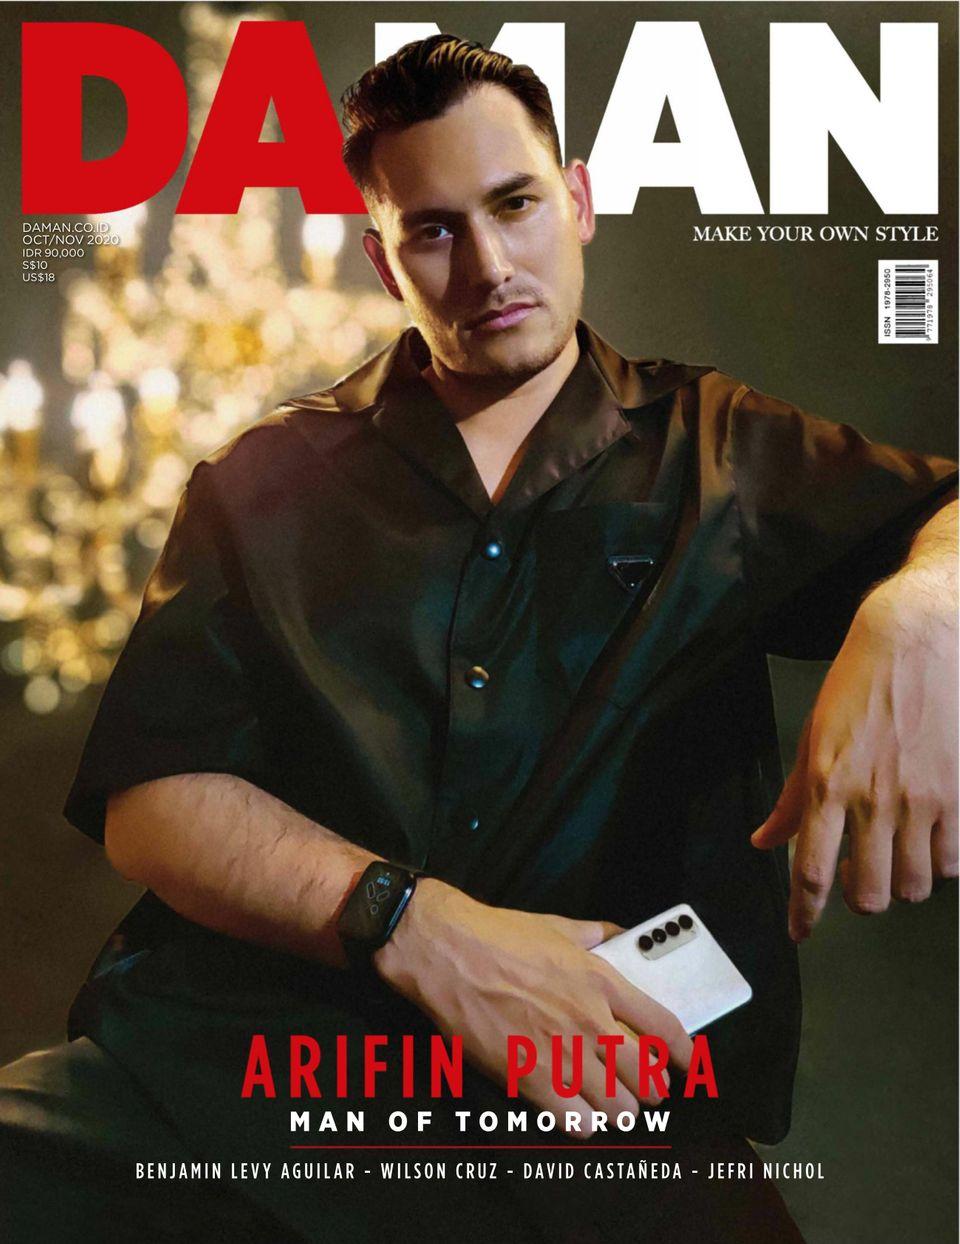 Da Man Magazine - Get your Digital Subscription